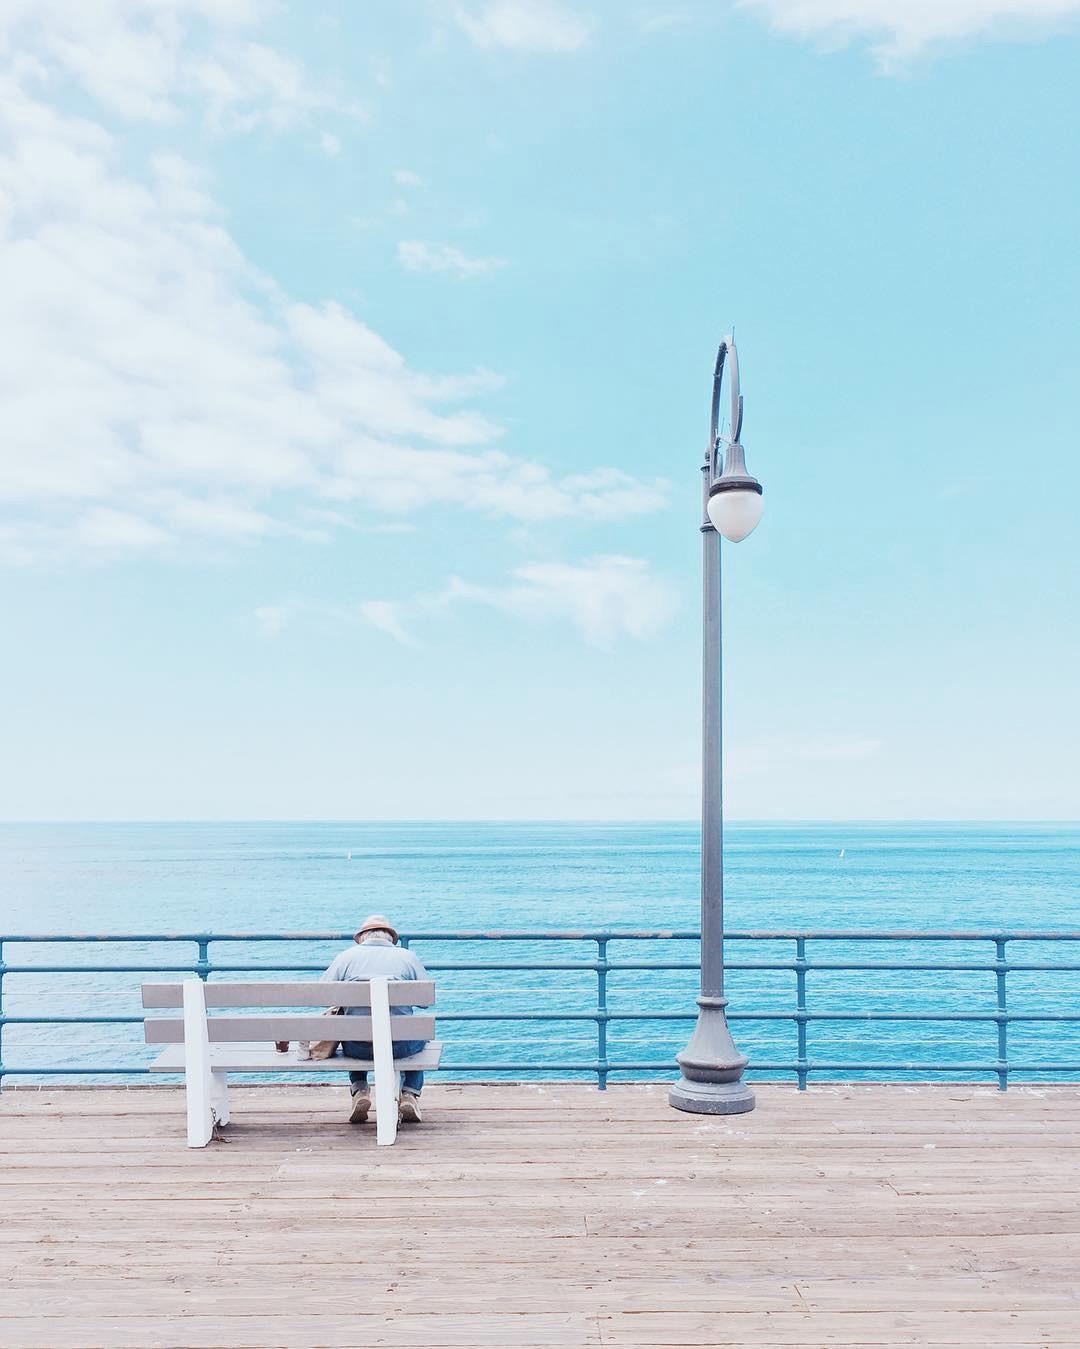 Foto no pier de Santa Mônica, California por @ danmagatti